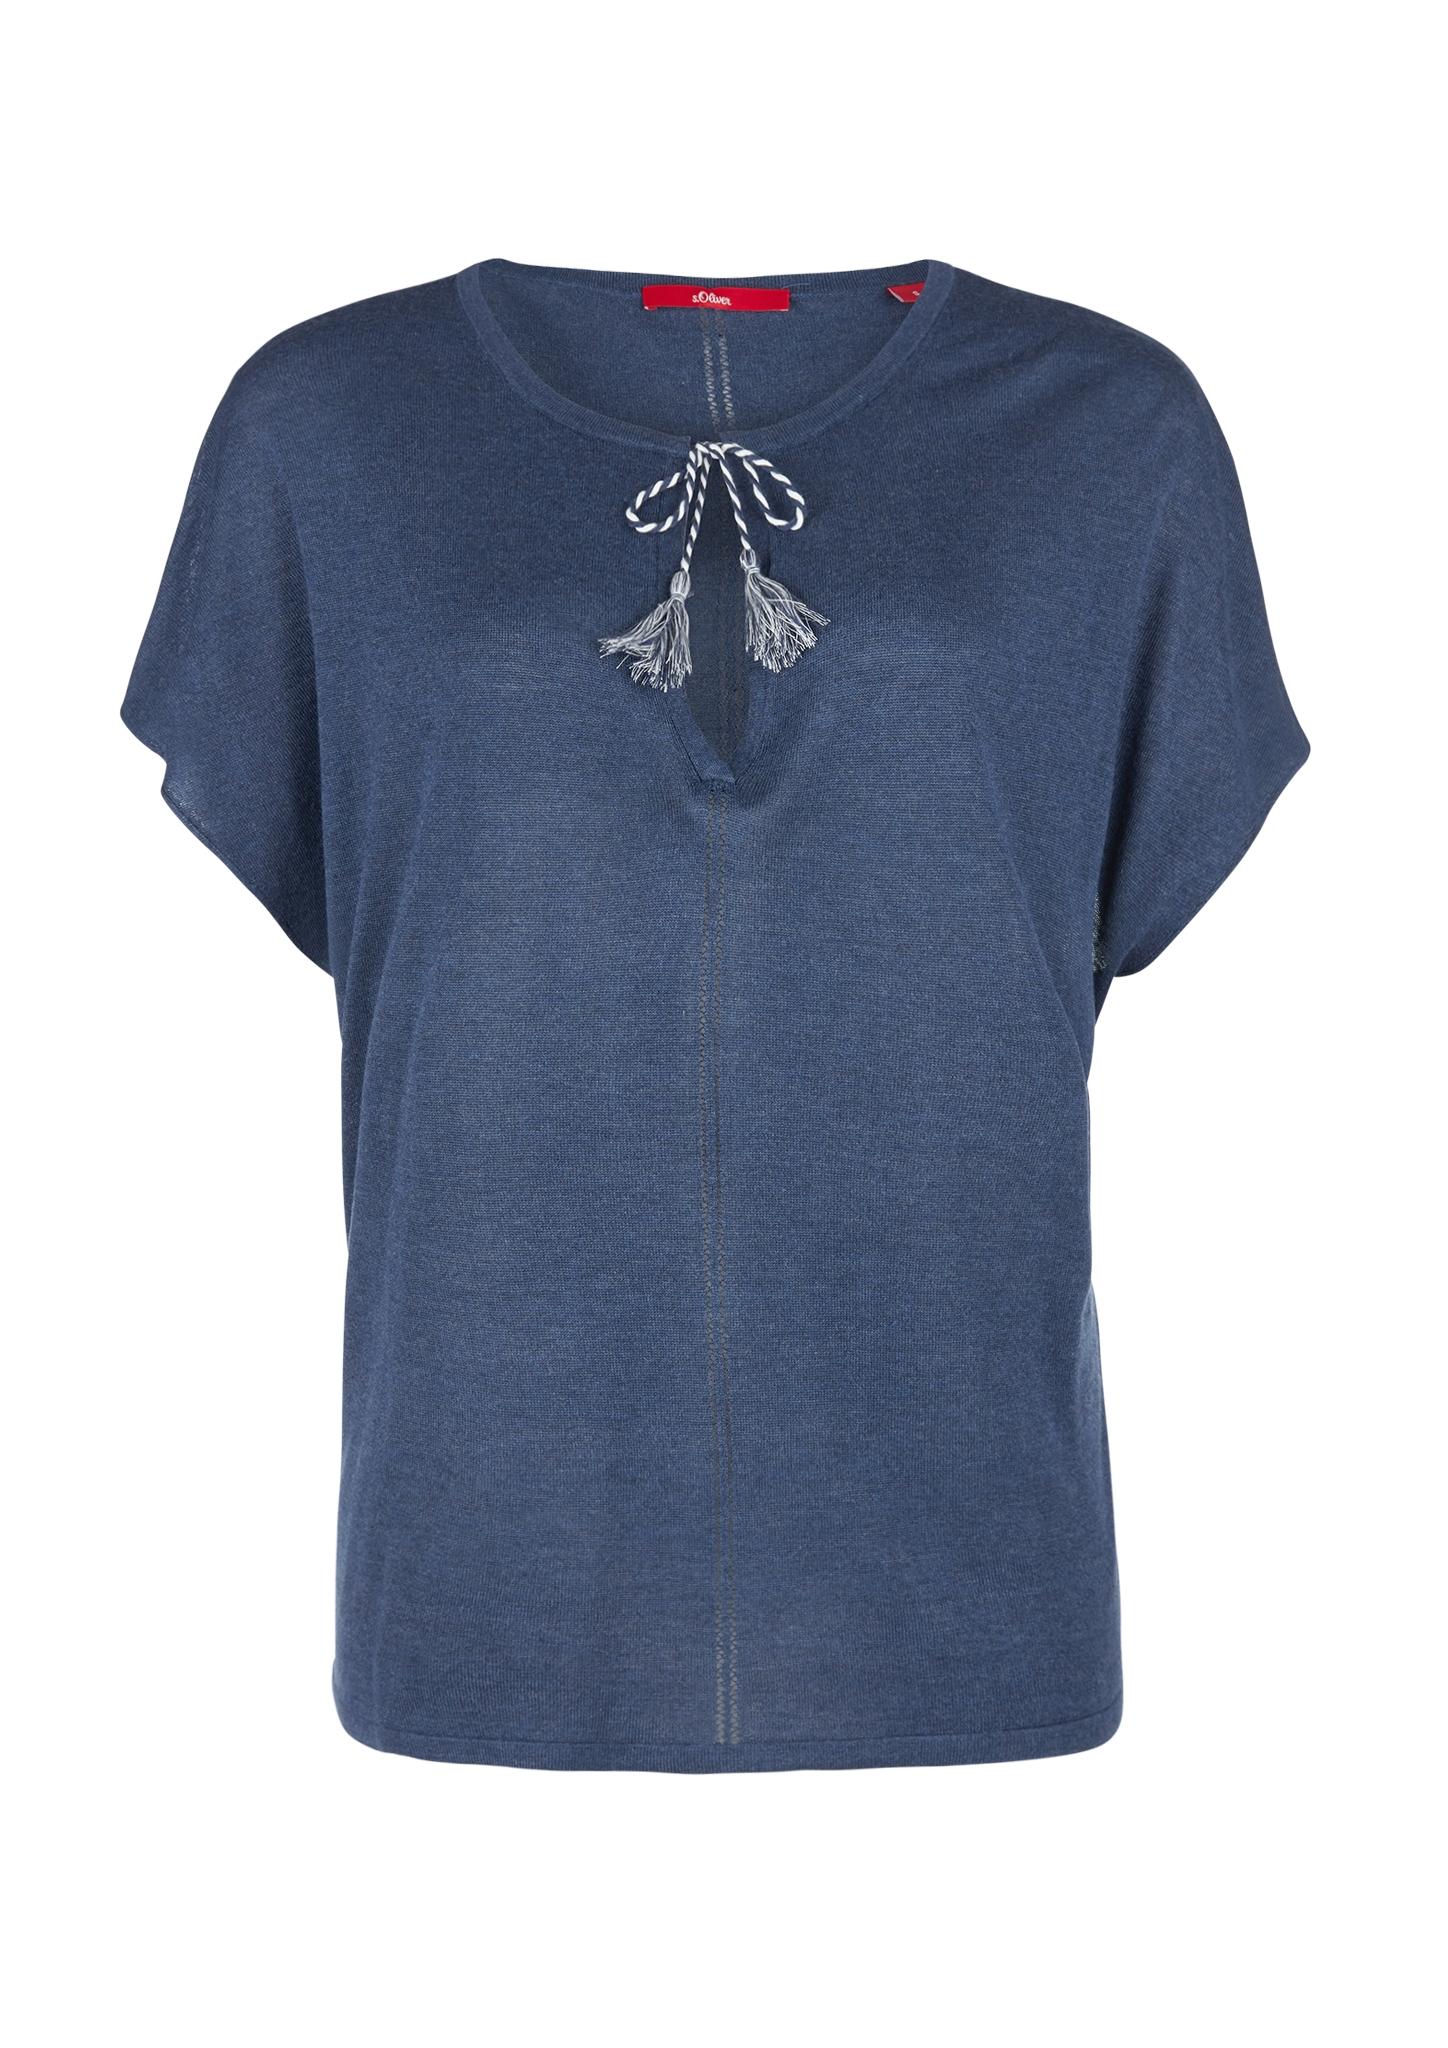 Kurzarmpullover | Bekleidung > Pullover > Kurzarmpullover | Blau | 80% viskose -  20% polyester | s.Oliver